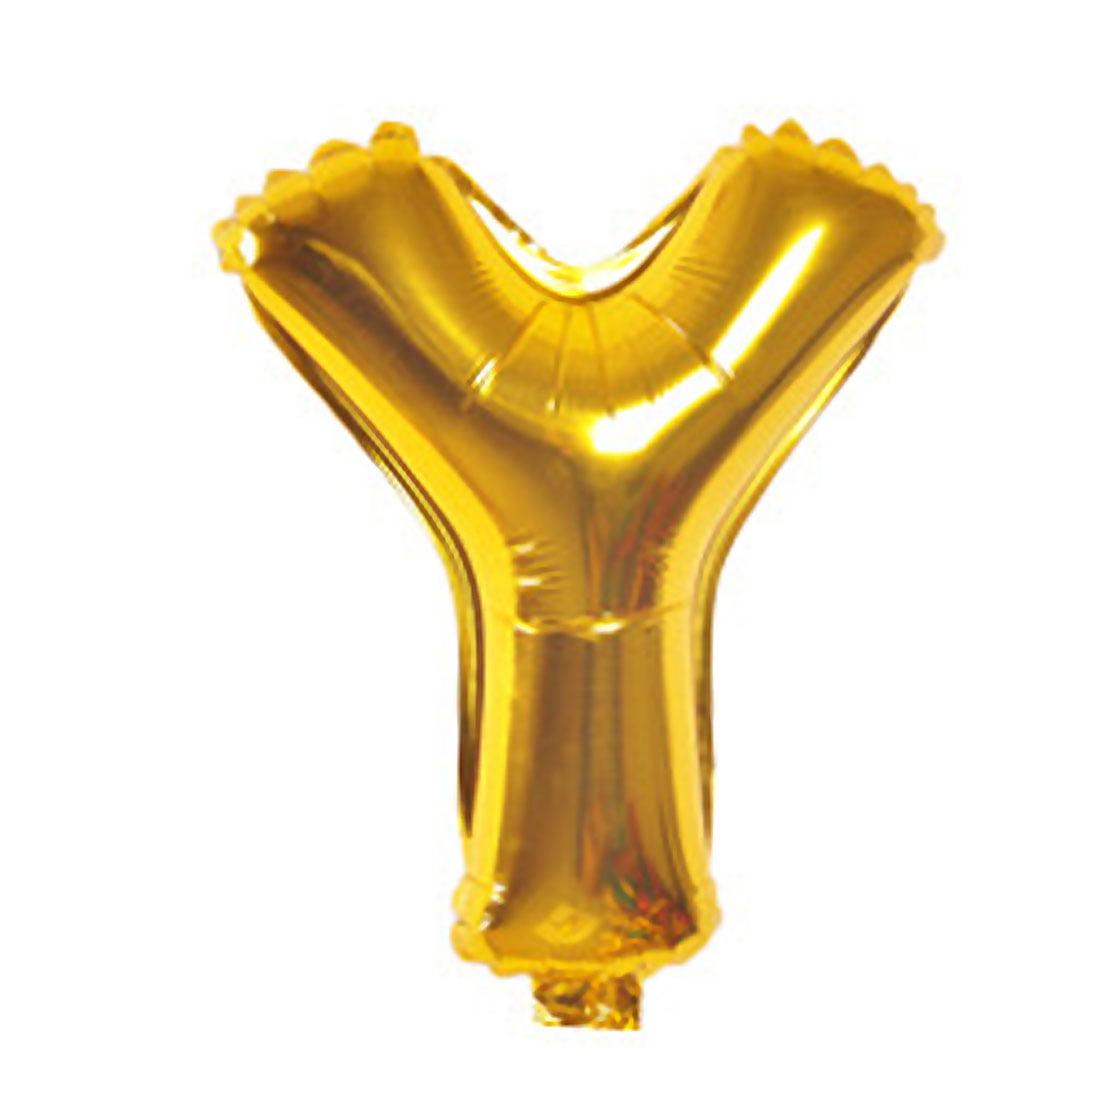 "Unique Bargains 40"" Gold Tone Foil Letter Y Balloon Helium Birthday Wedding Festival Decor"